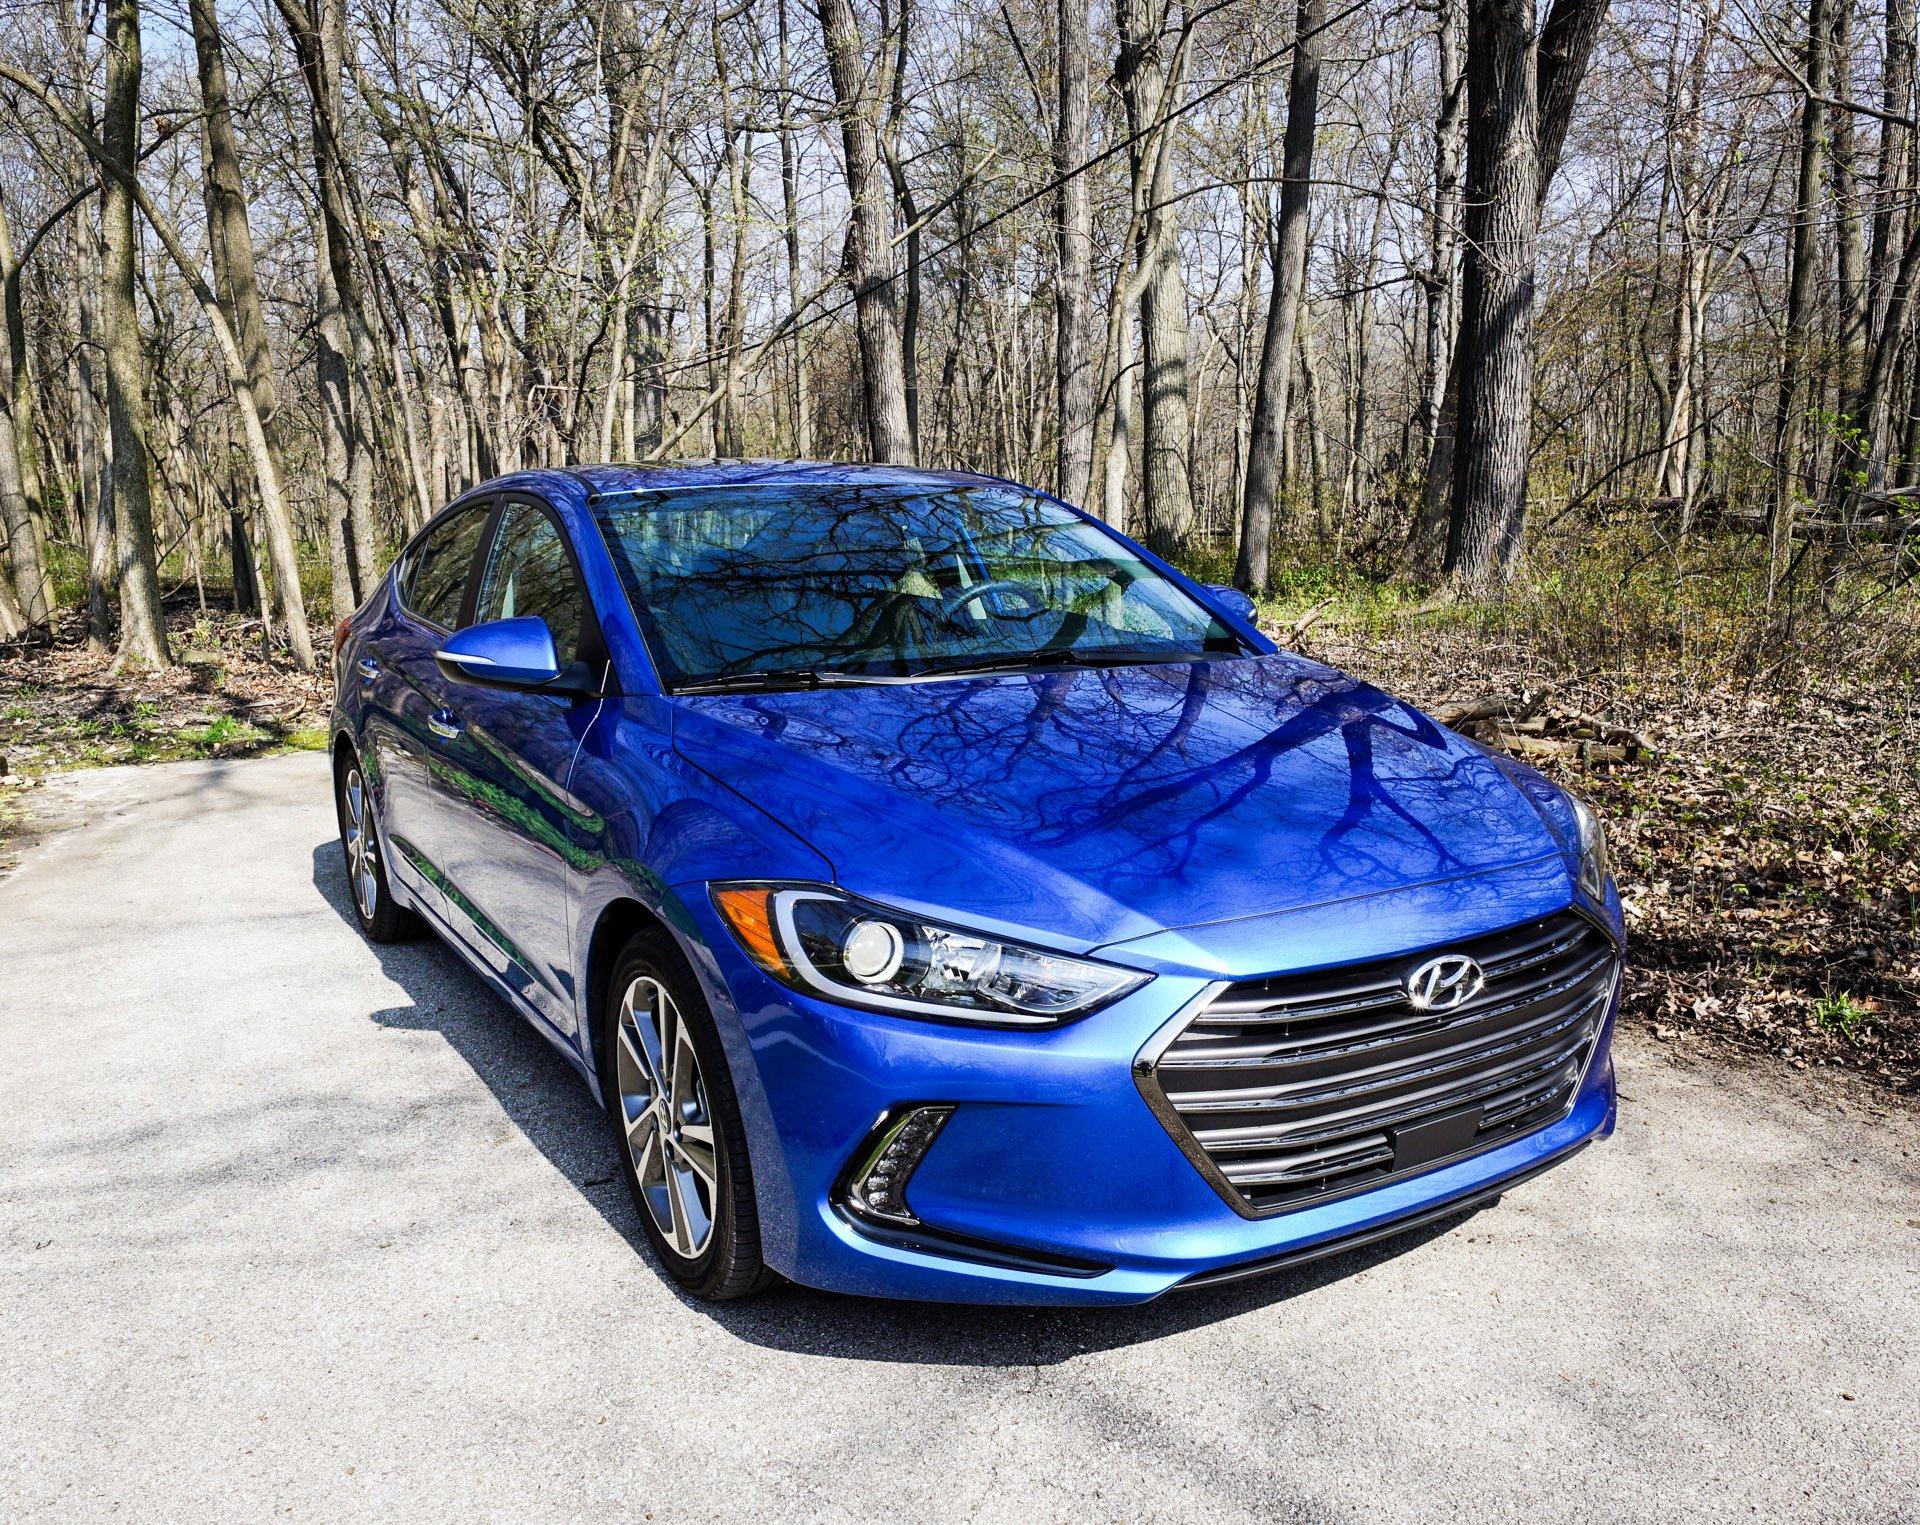 Review: 2017 Hyundai Elantra Limited